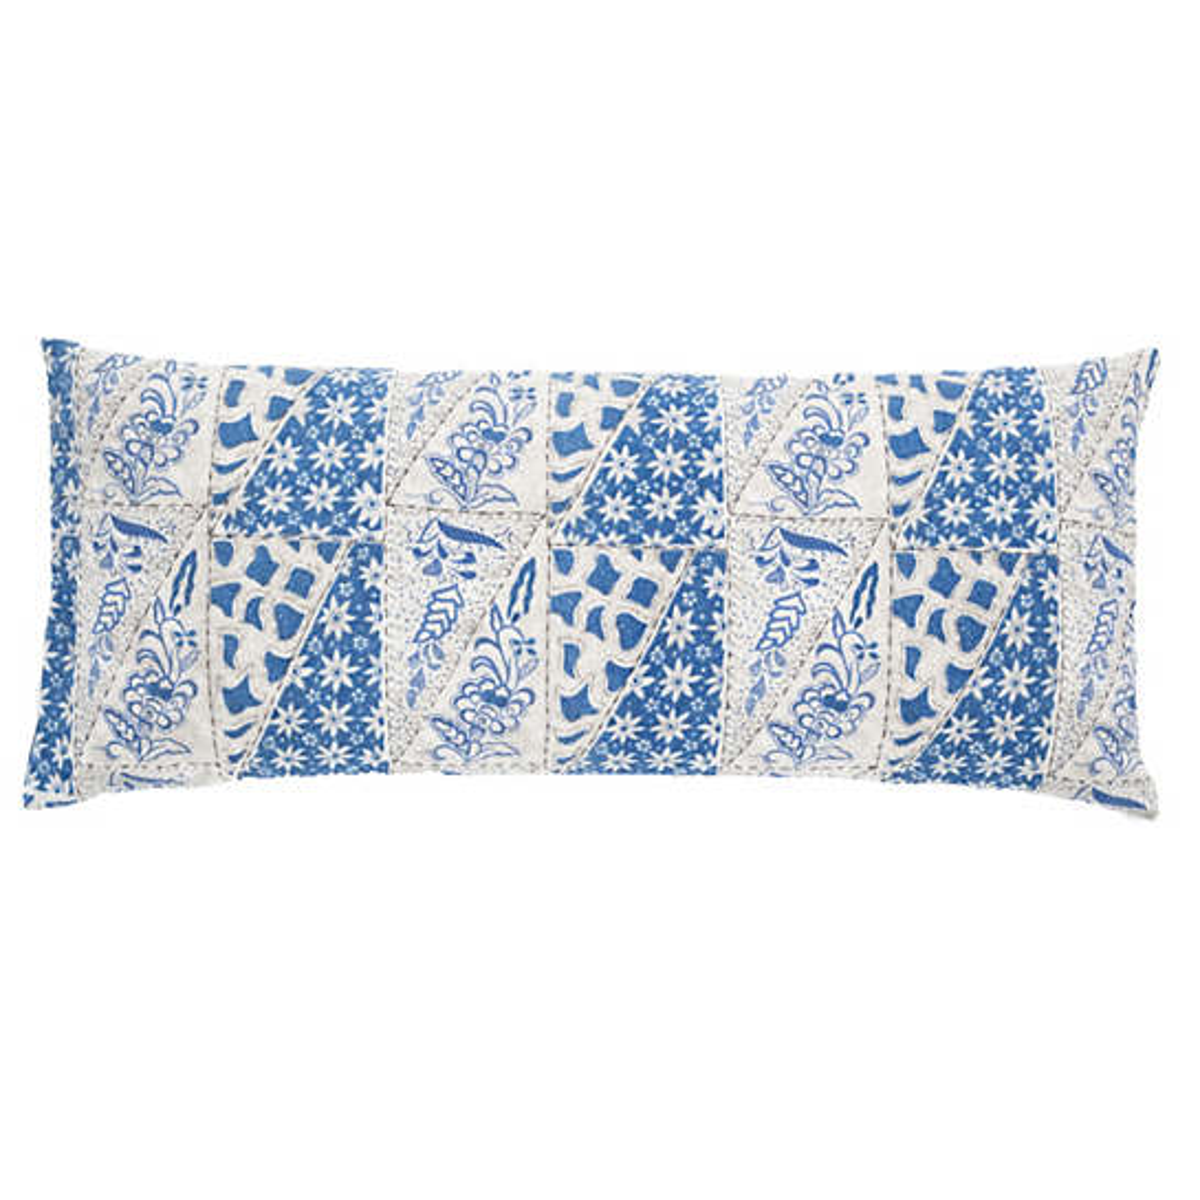 Cana Blue Decorative Pillow